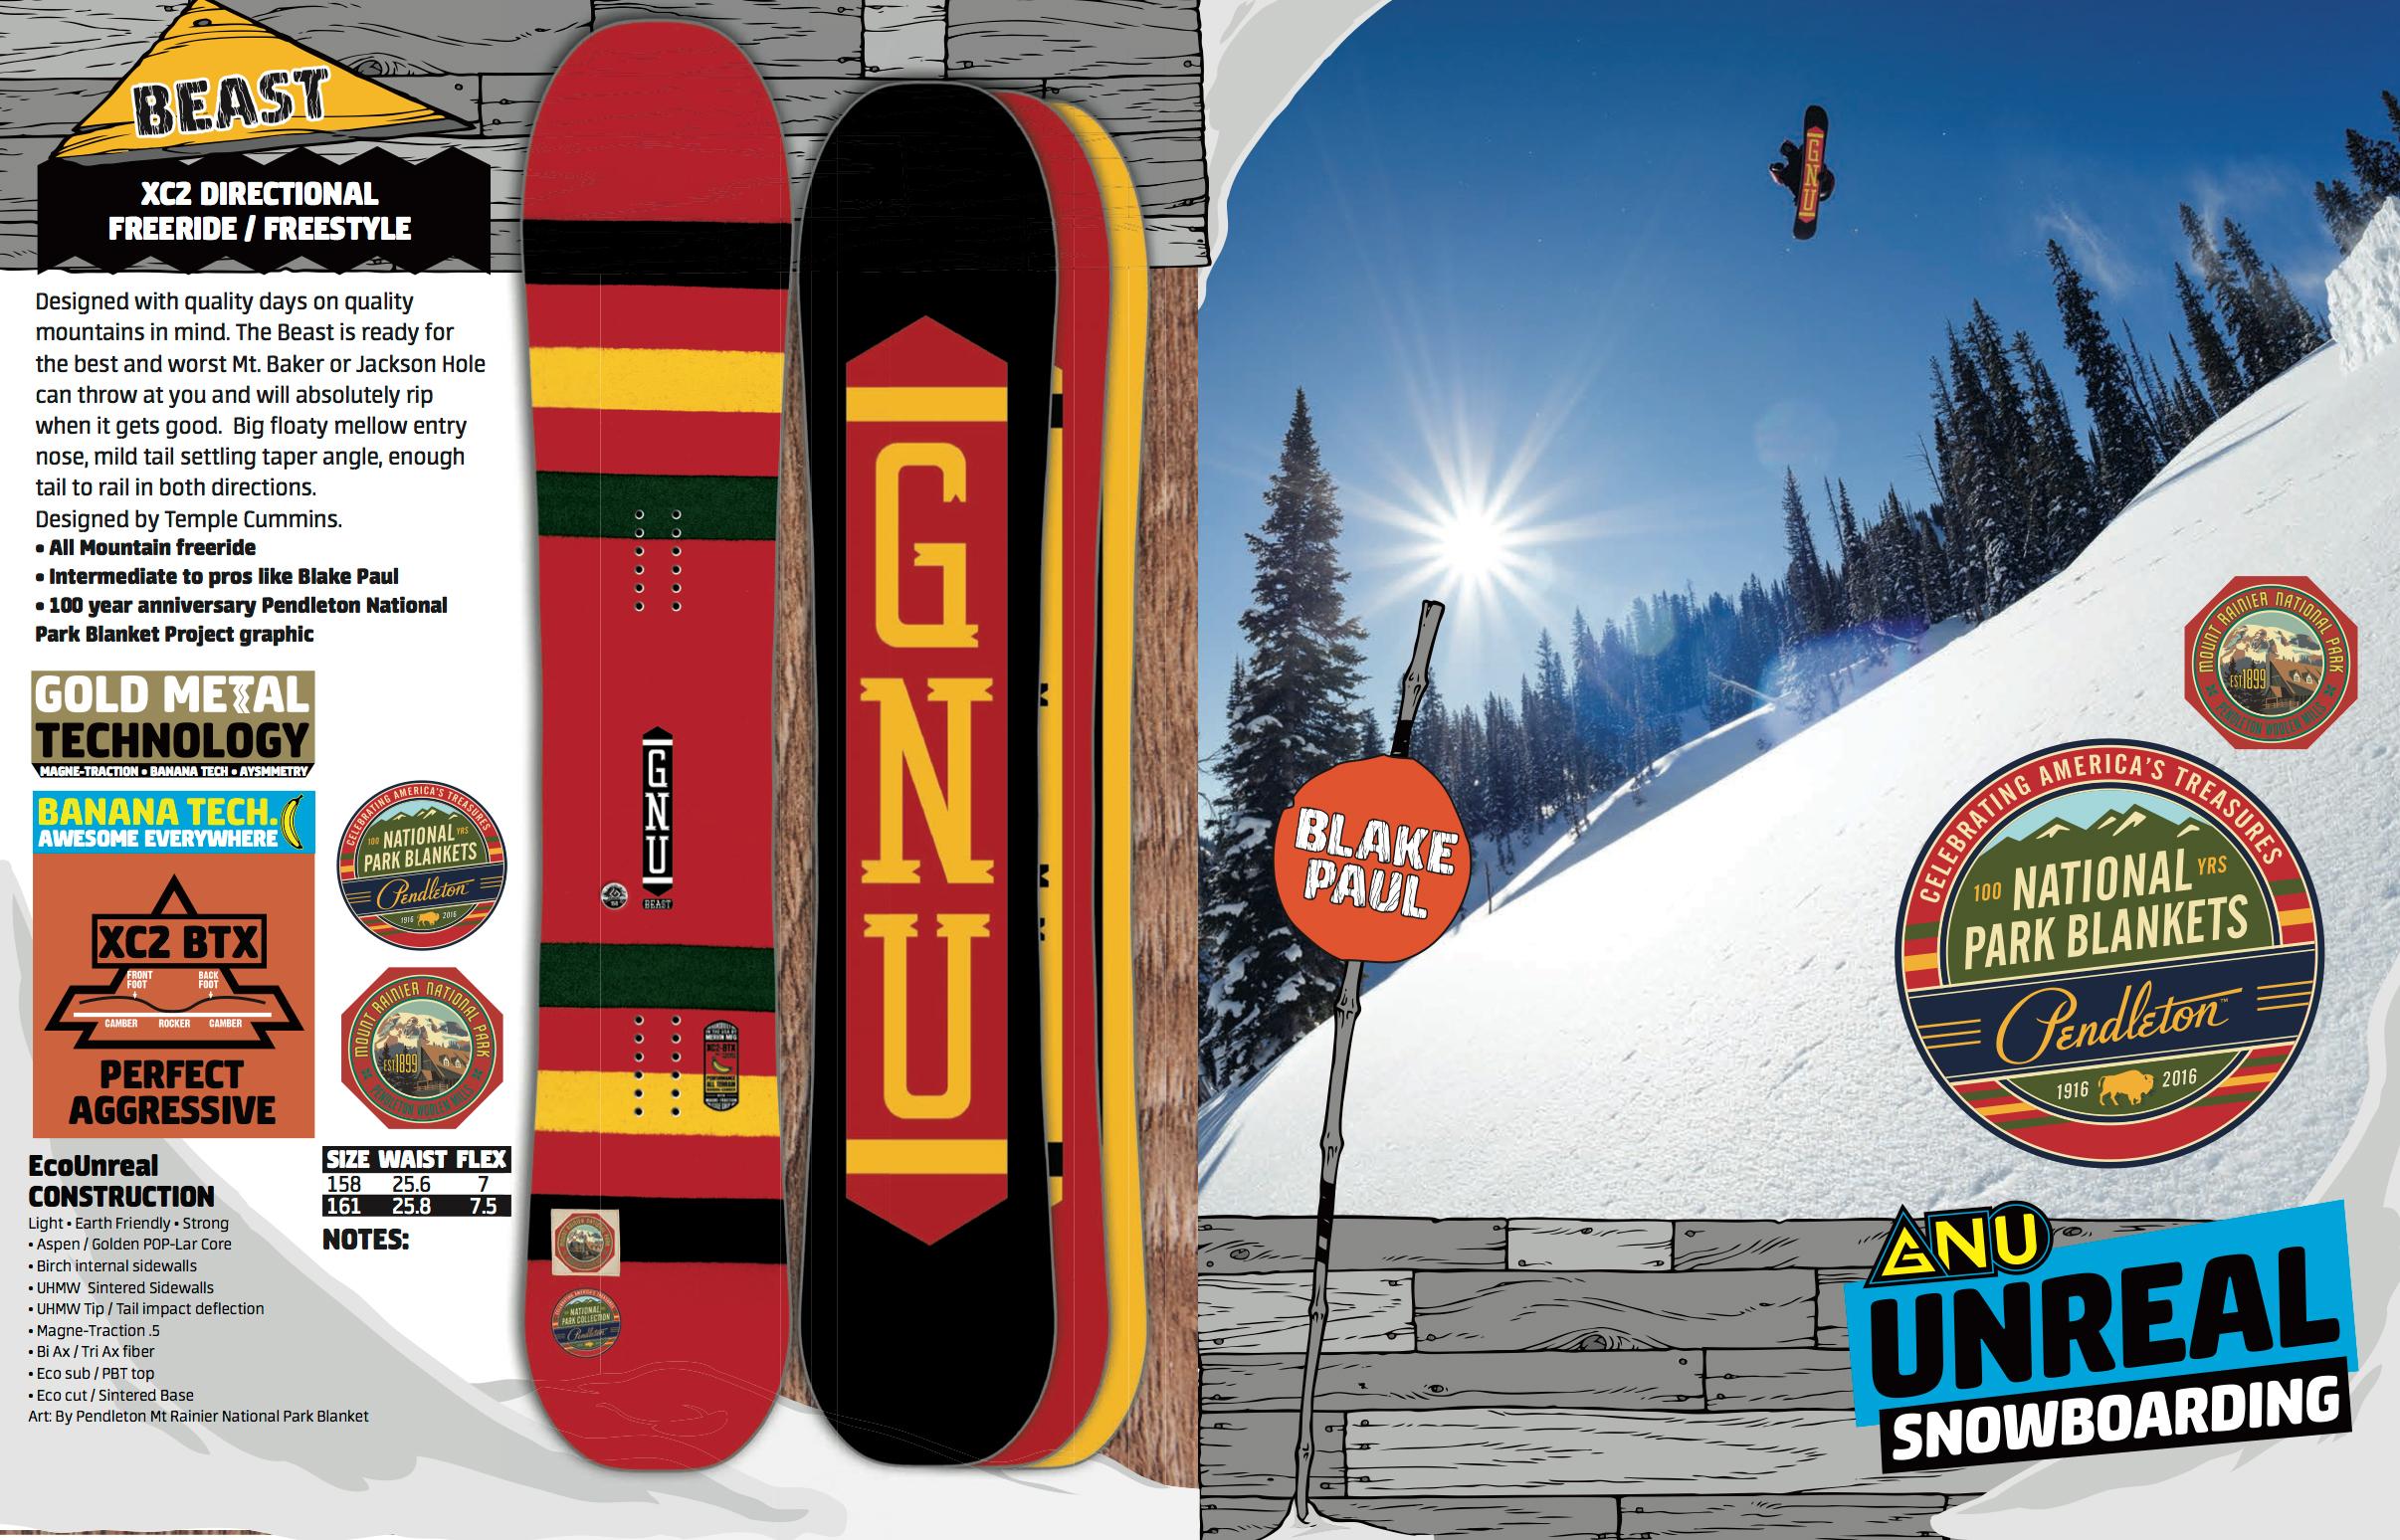 Snowboarding Magazine spread